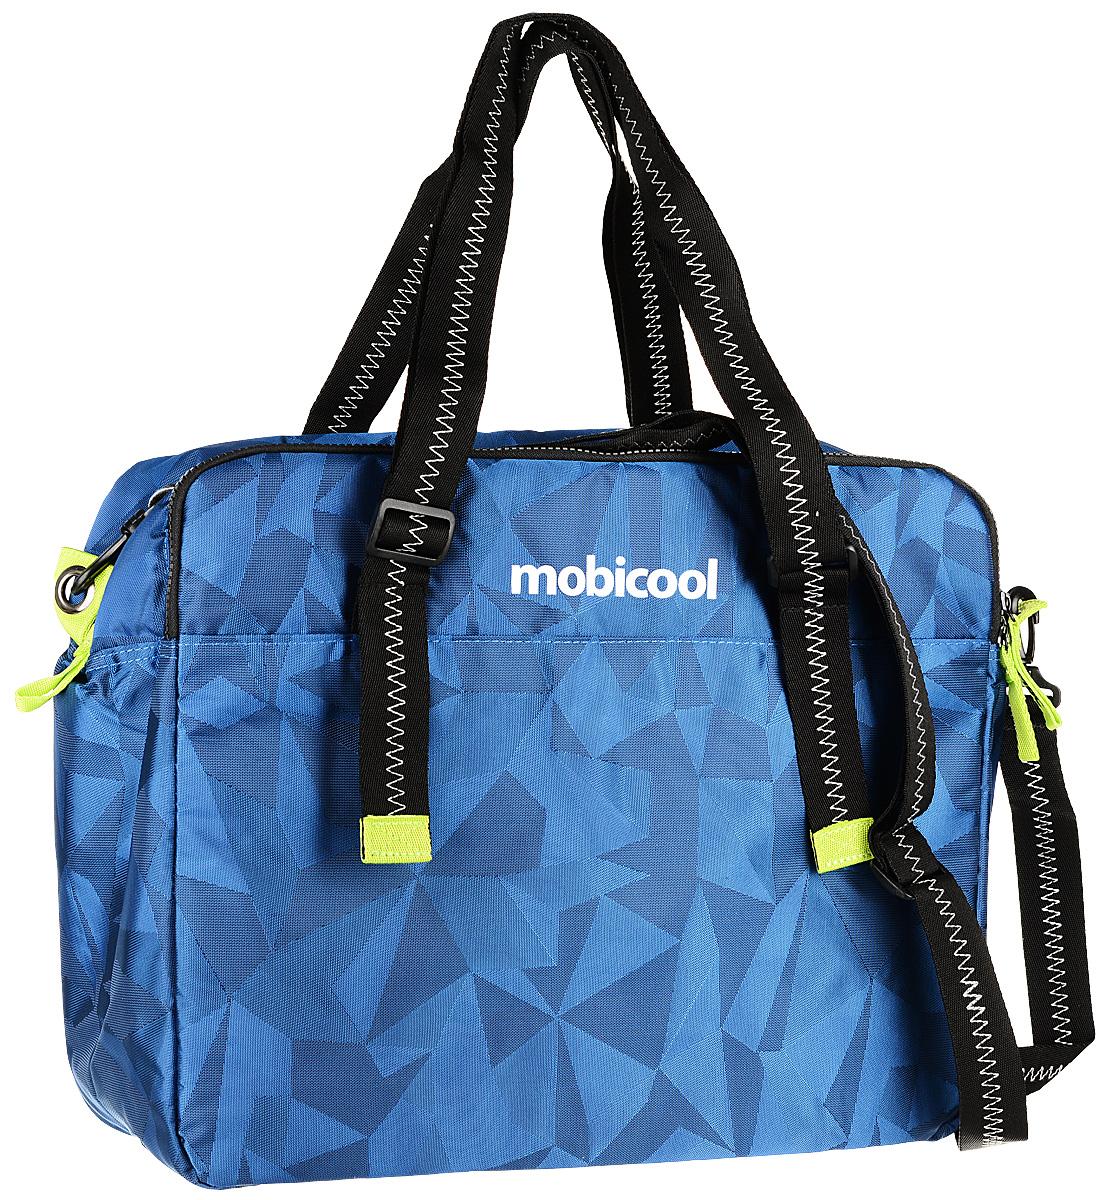 Термосумка MobiCool Sail 25, цвет: синий, 40 х 17 х 33 см термосумка mobicool sail 13 цвет синий 39 х 32 х 14 см